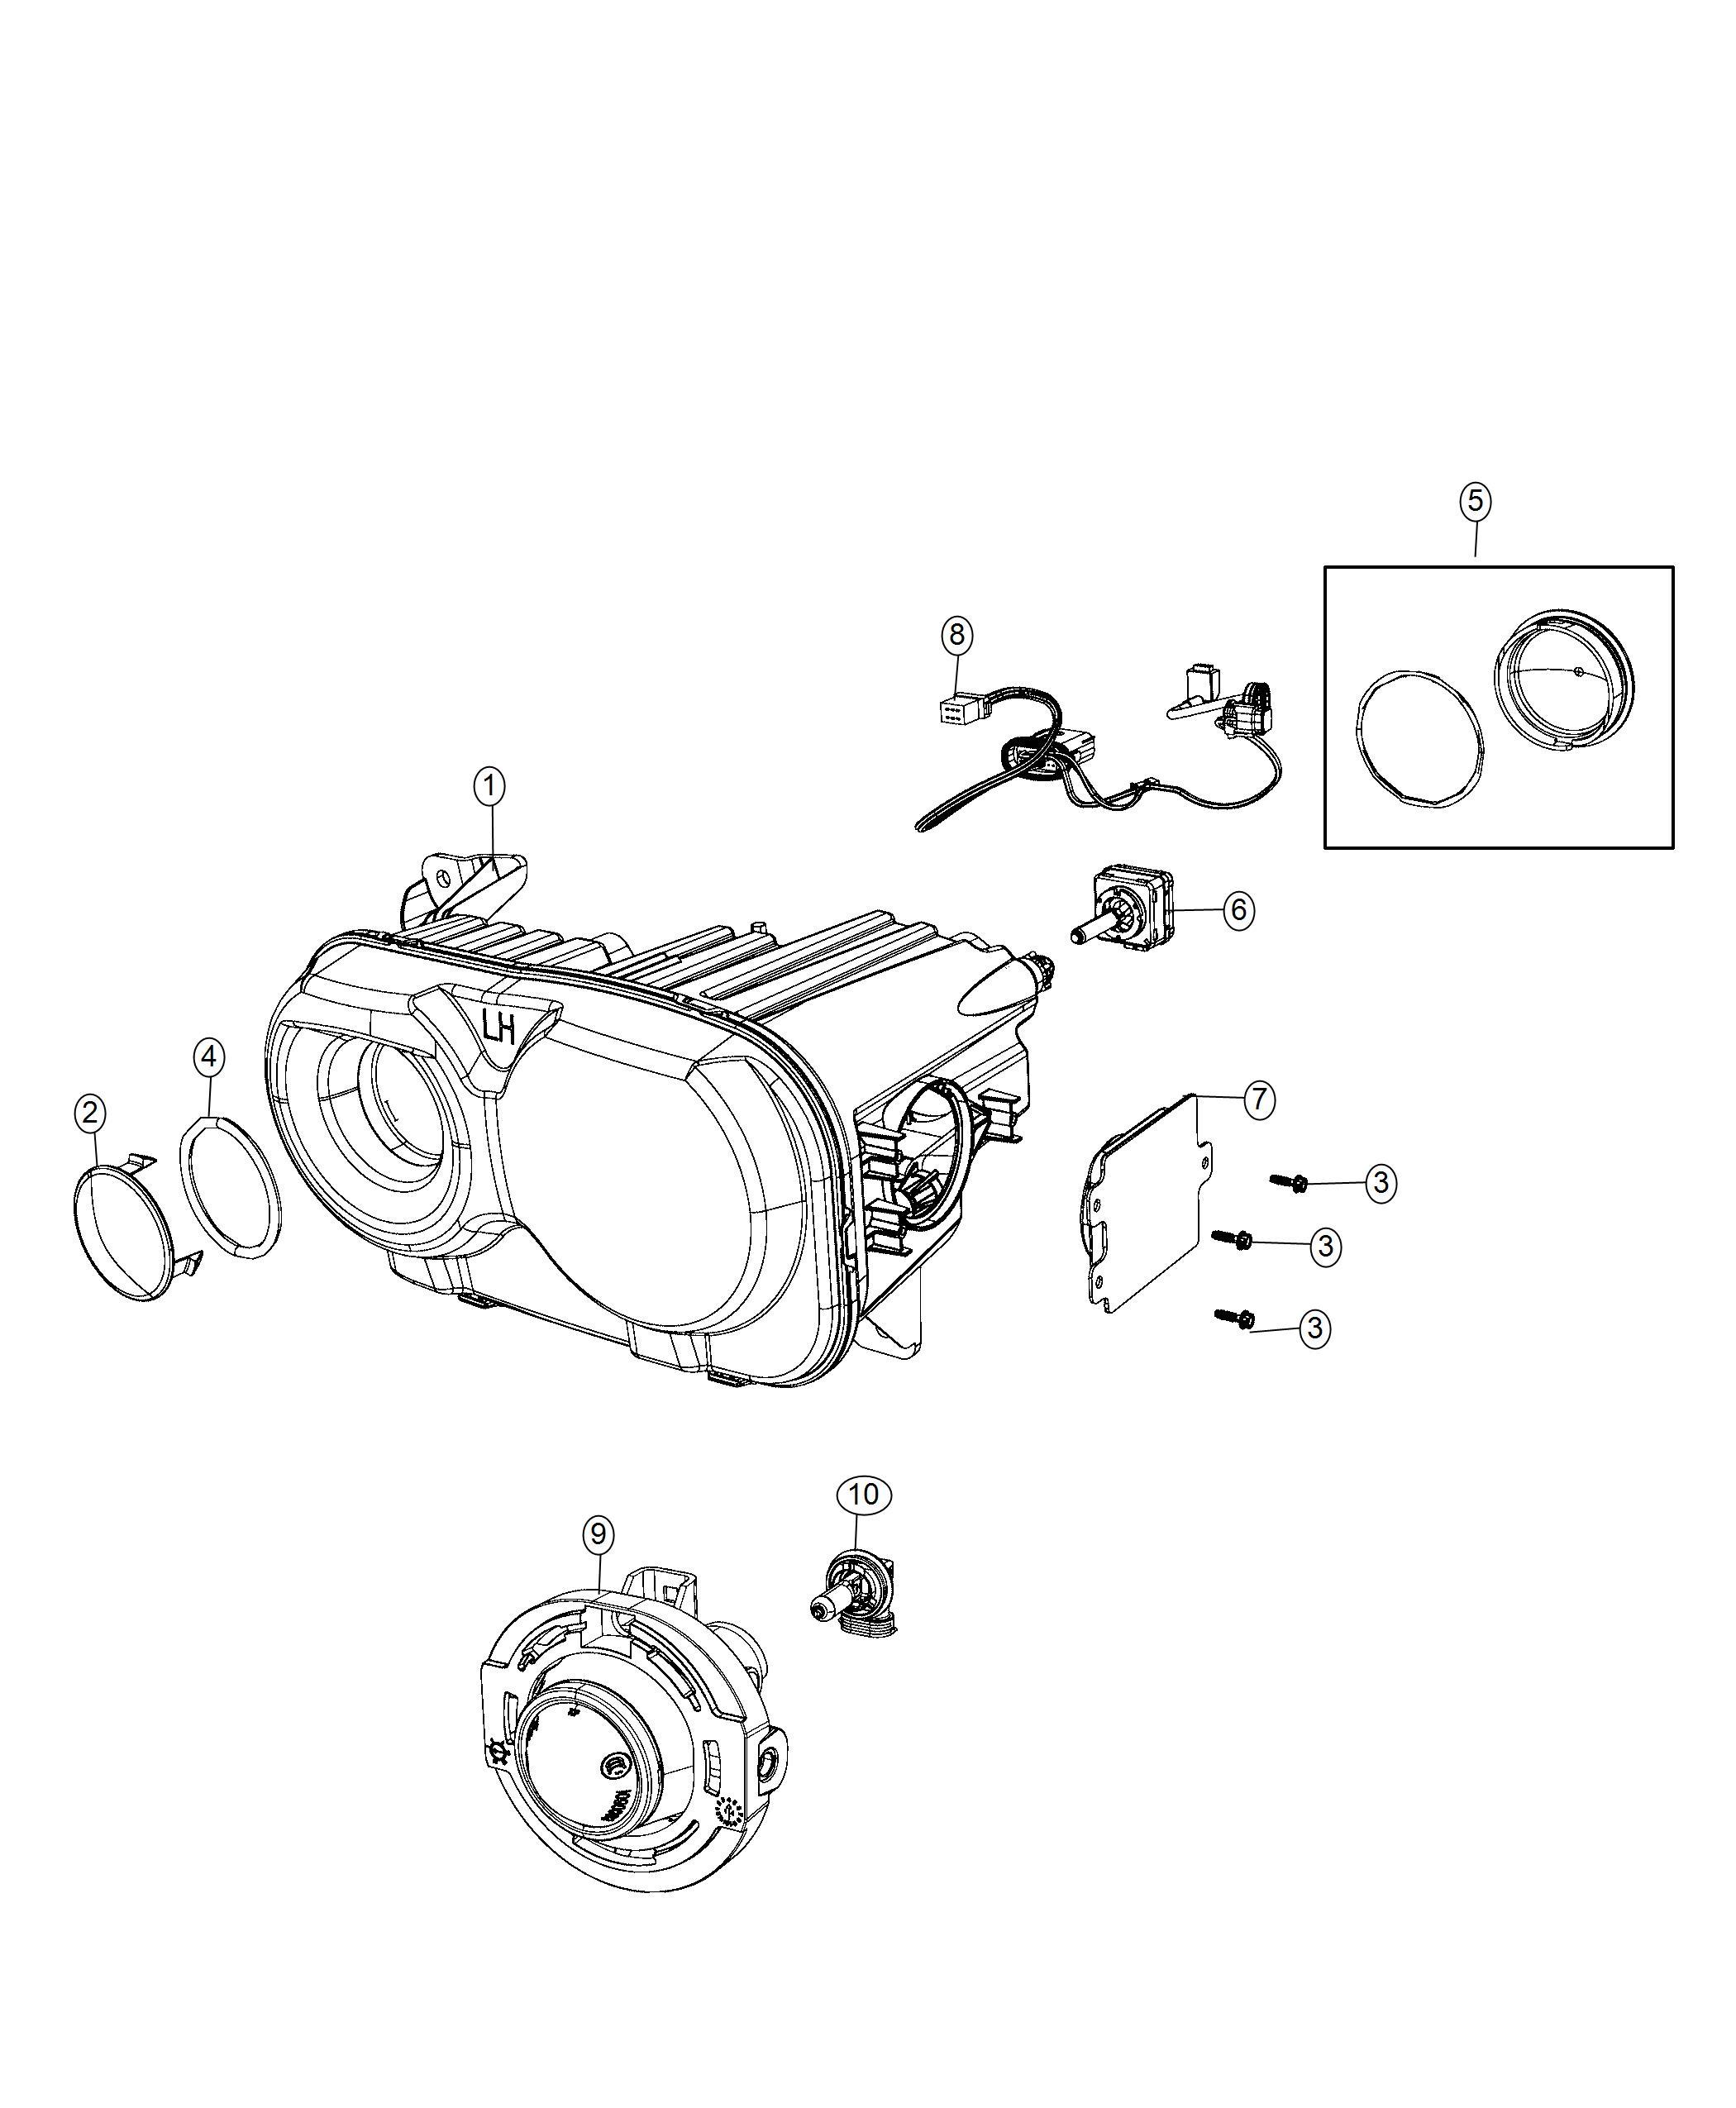 Dodge Challenger Wiring Jumper Hid Left Right